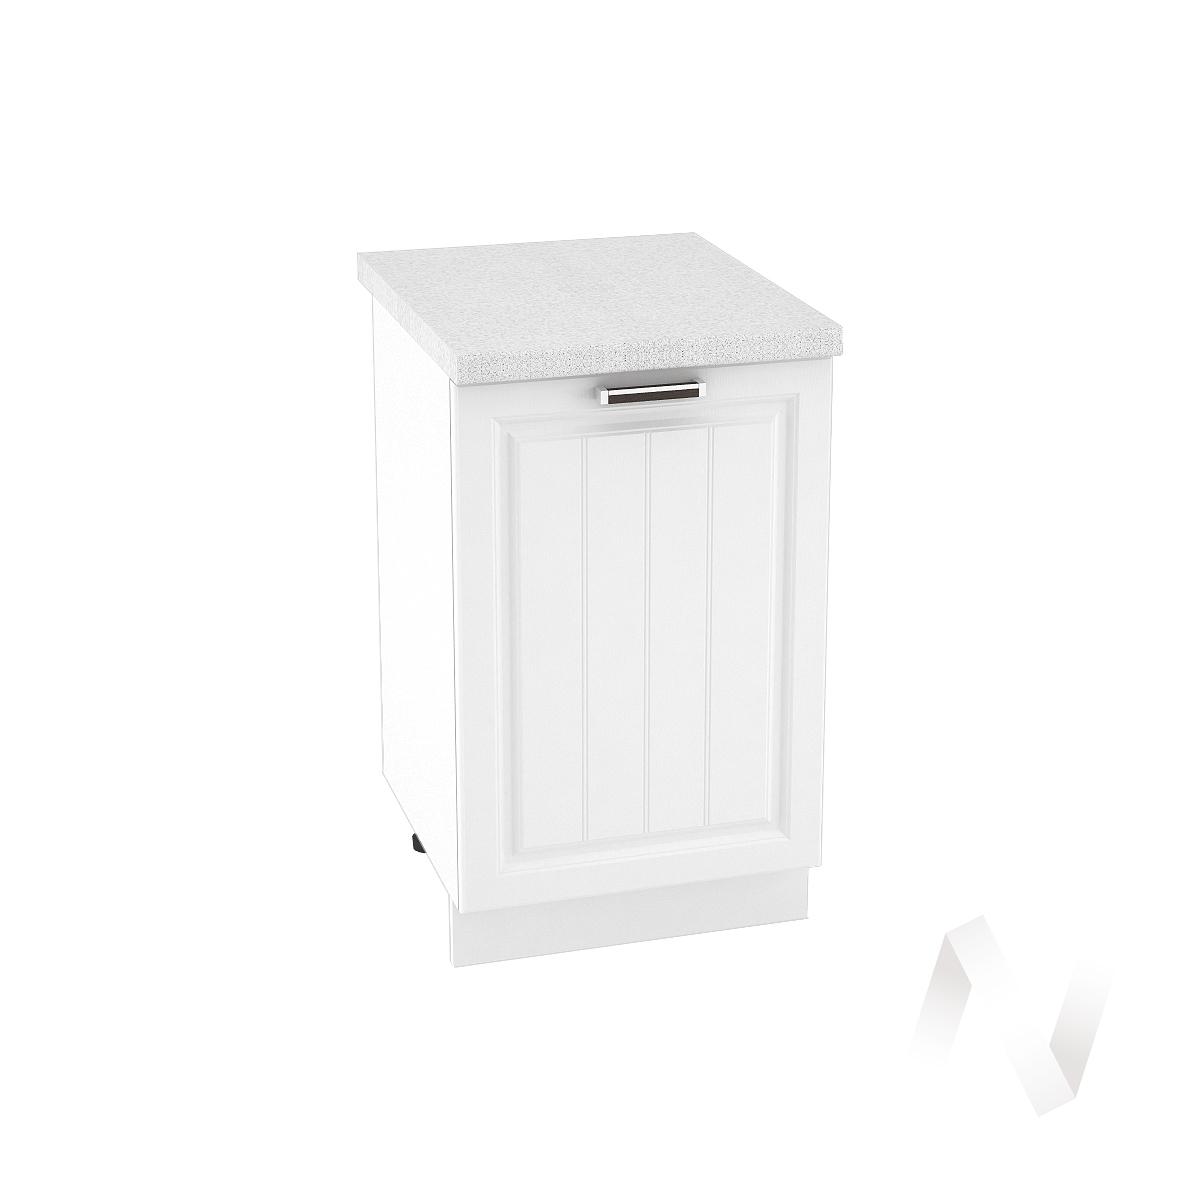 "Кухня ""Прага"": Шкаф нижний 500, ШН 500 (белое дерево/корпус белый)"